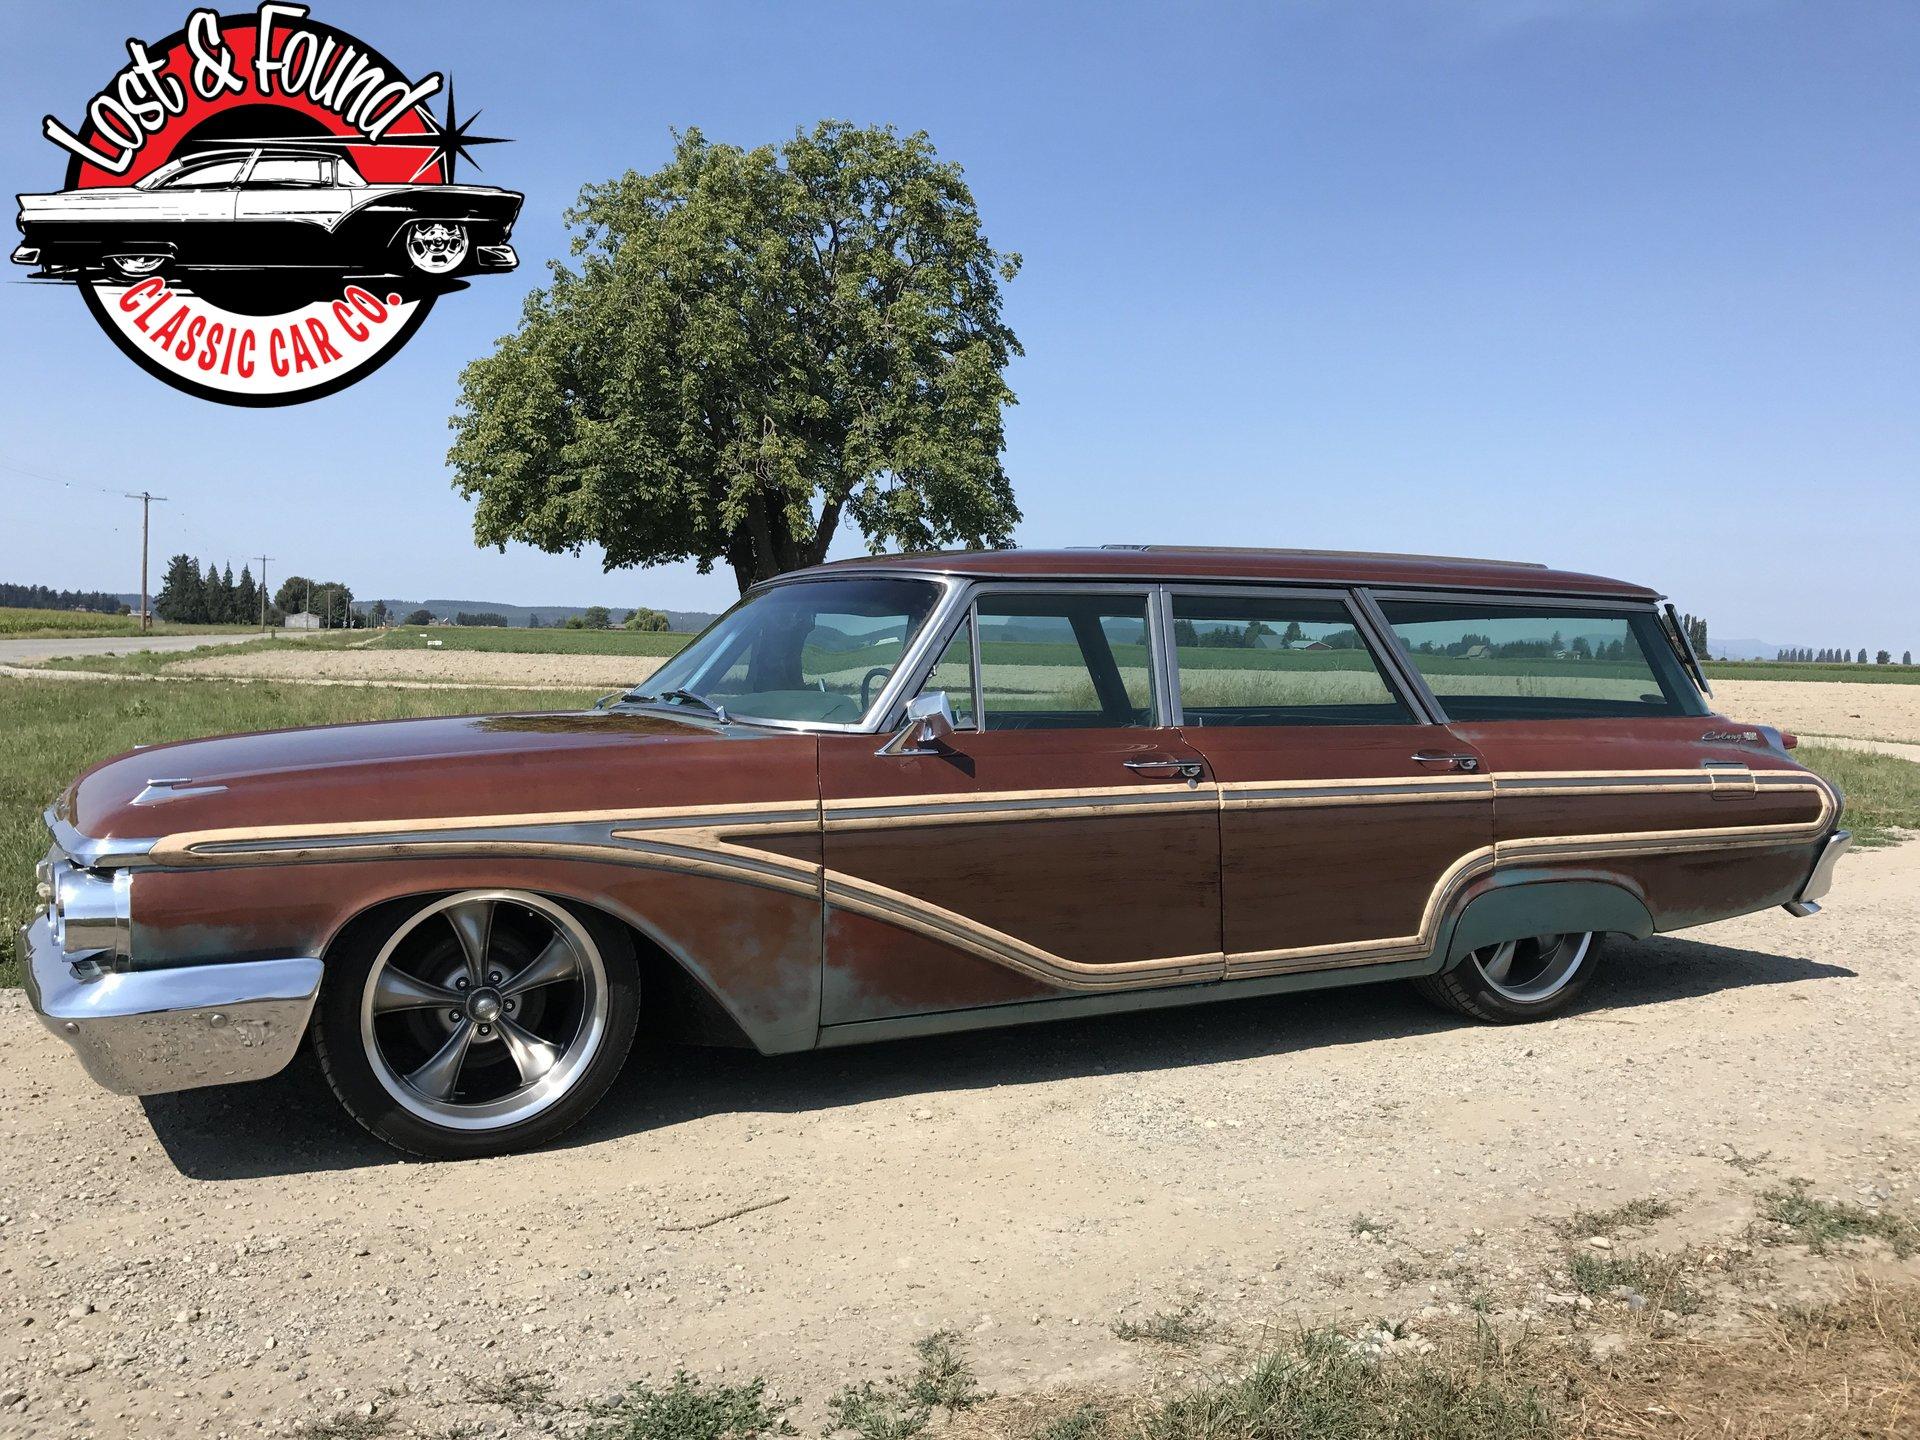 1962 Mercury Colony Park Wagon For Sale 98808 Mcg